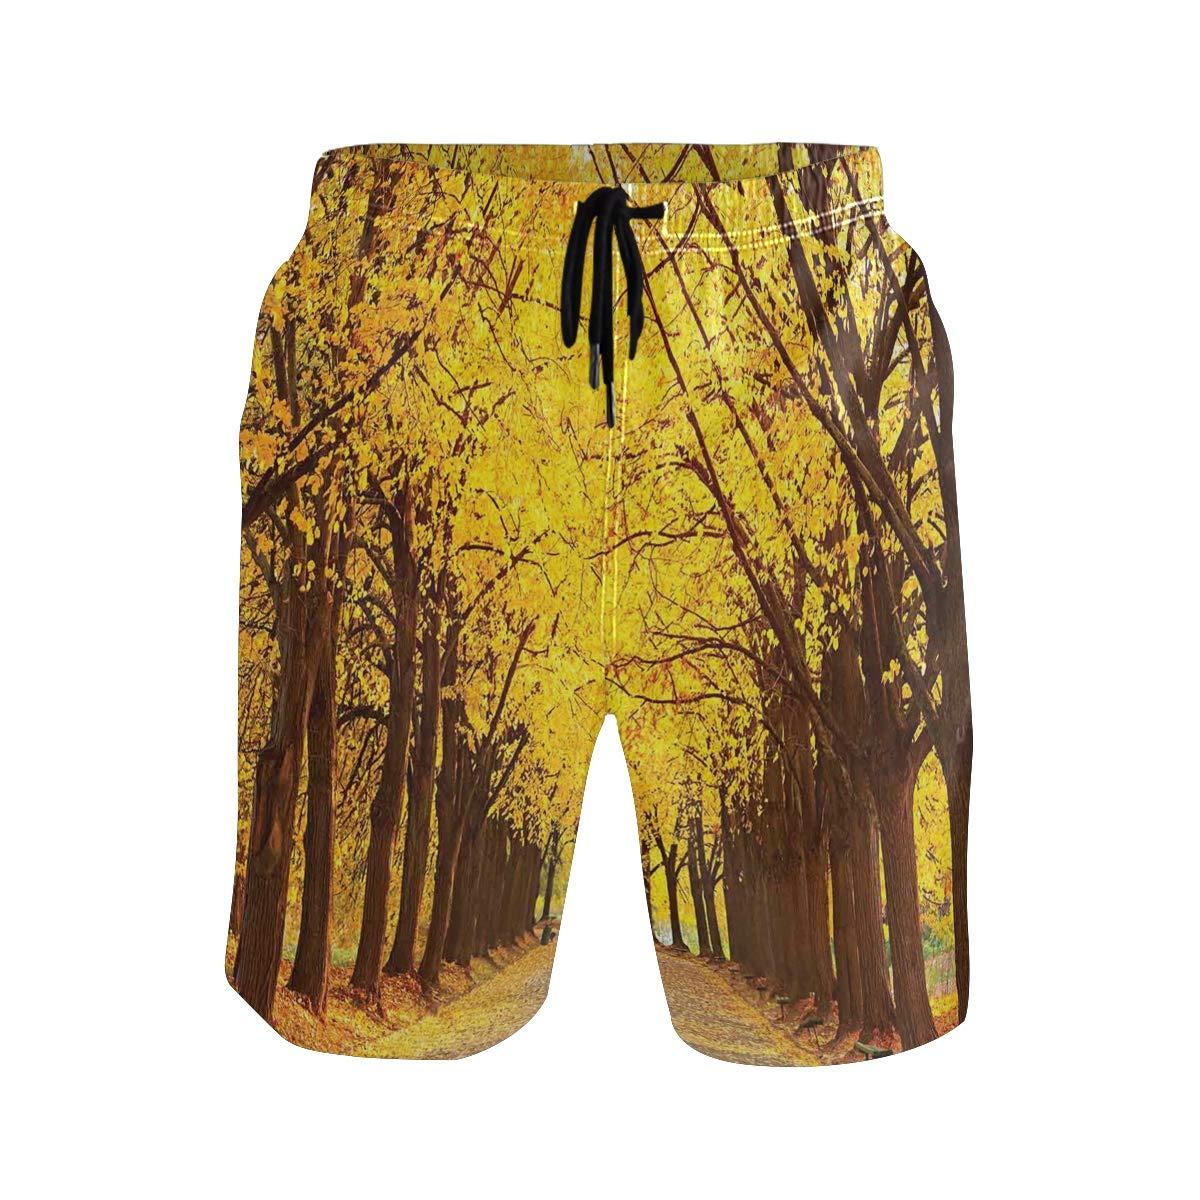 COVASA Mens Summer ShortsBotanical Hawaii Jungle Pattern with Palm Leaves Exot